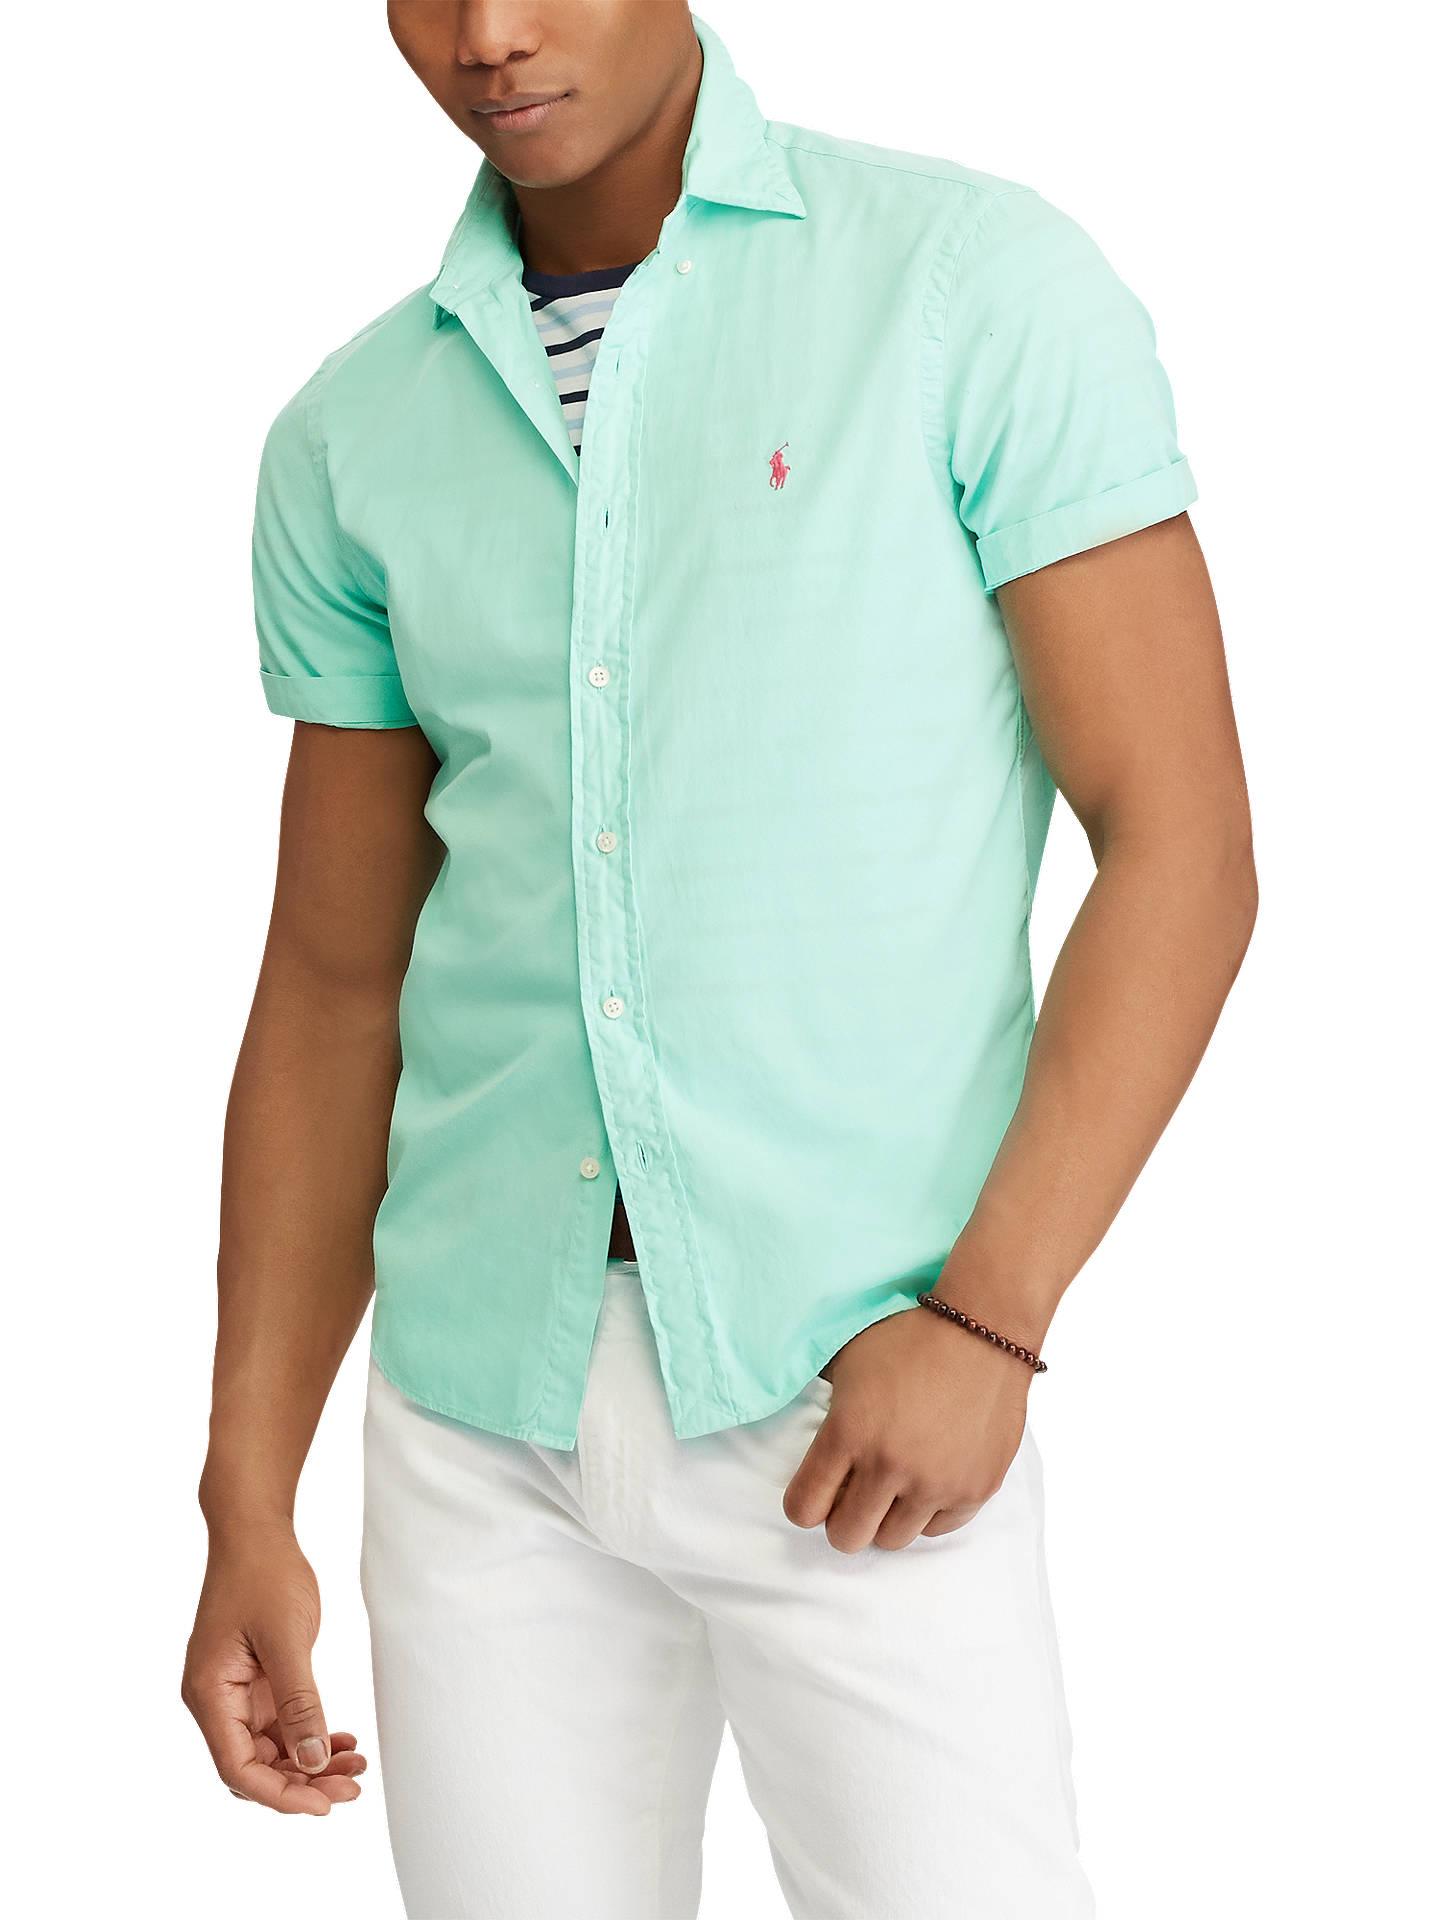 At Lewisamp; Shirt Polo Ralph Partners Lauren John Short Slim Fit Sleeve eWIYD29EH